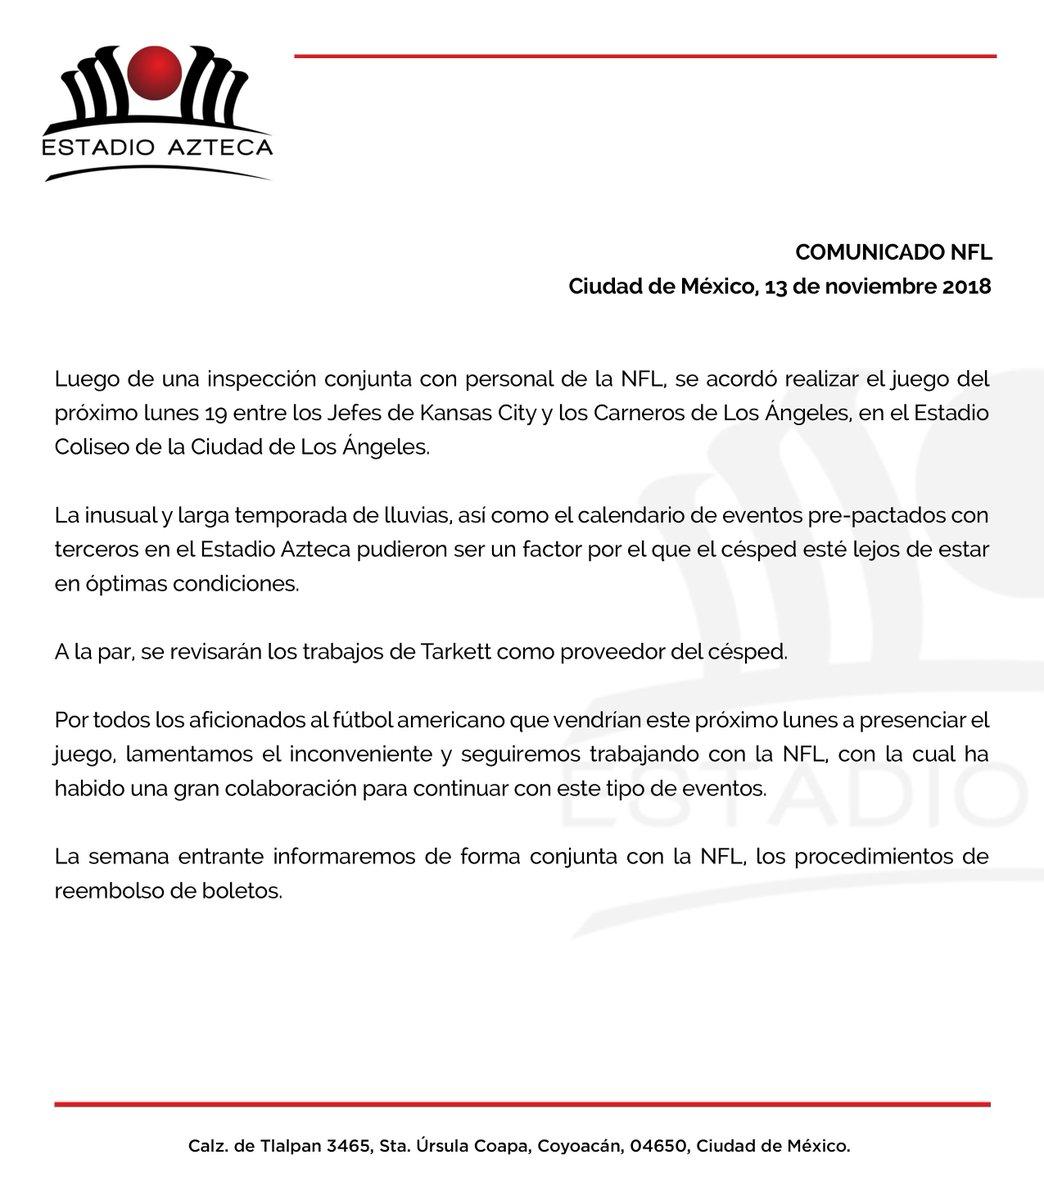 Estadio Azteca On Twitter Comunicado Nfl